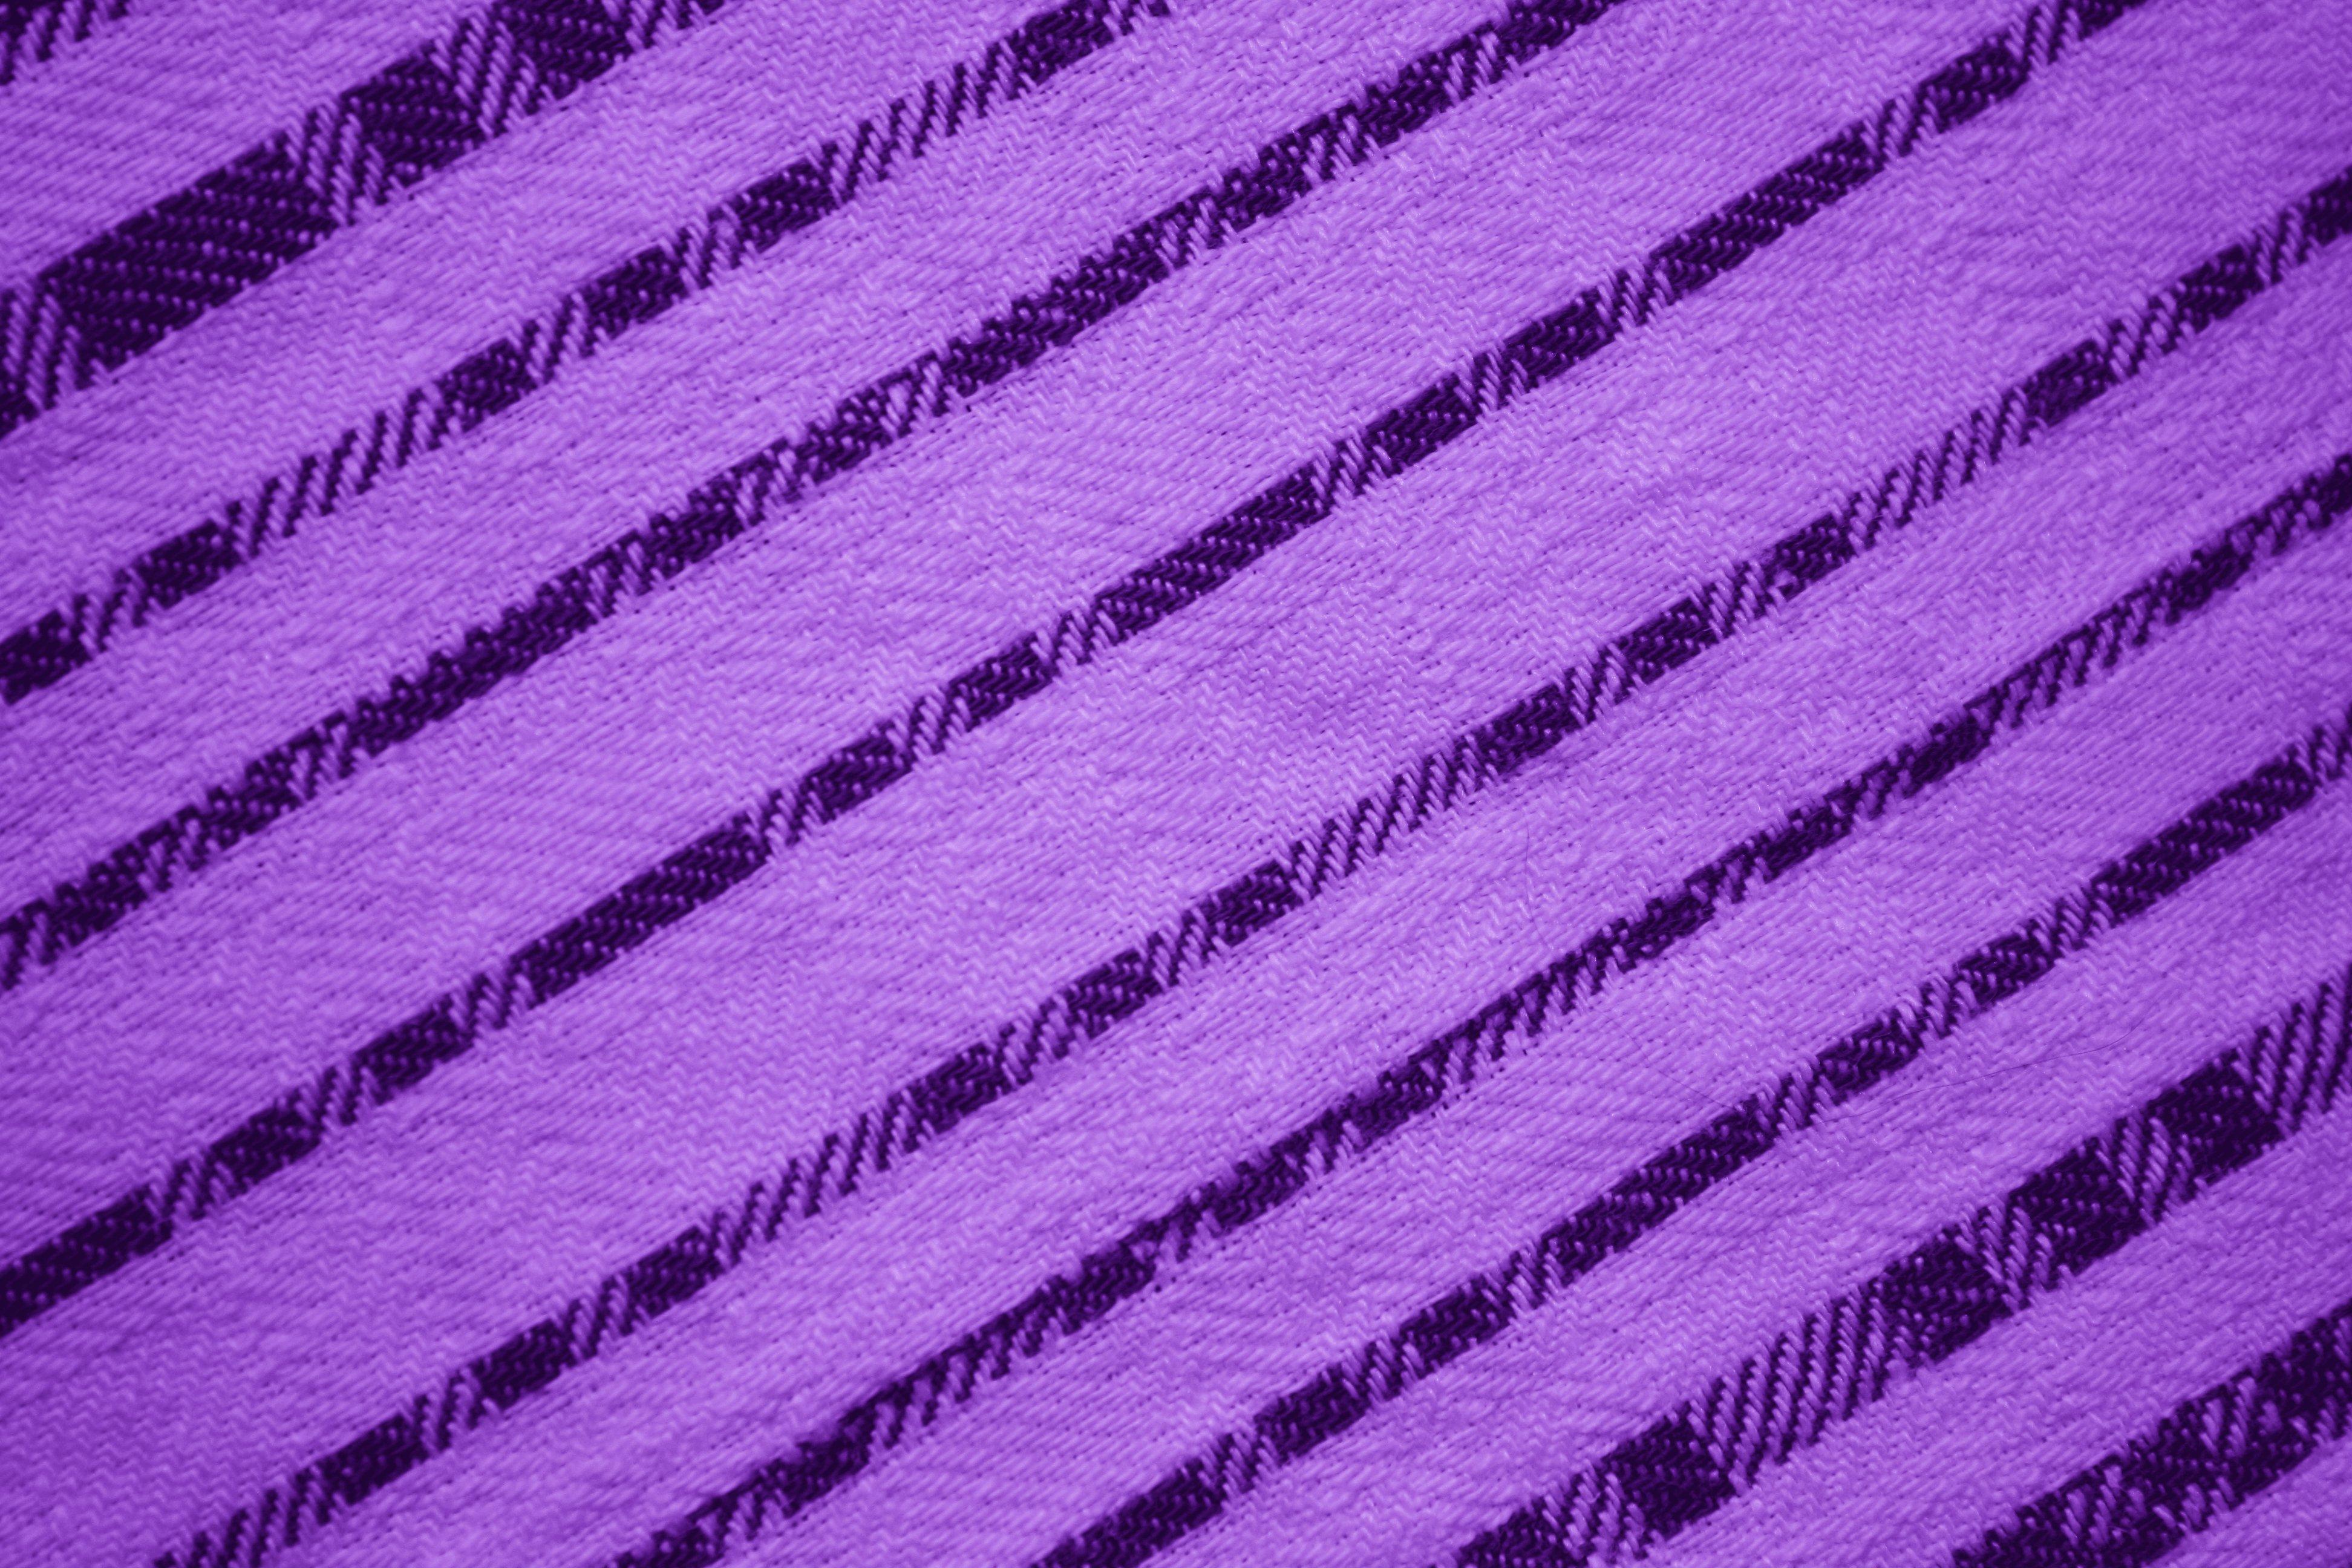 Purple Diagonal Stripes Fabric Texture Picture Free